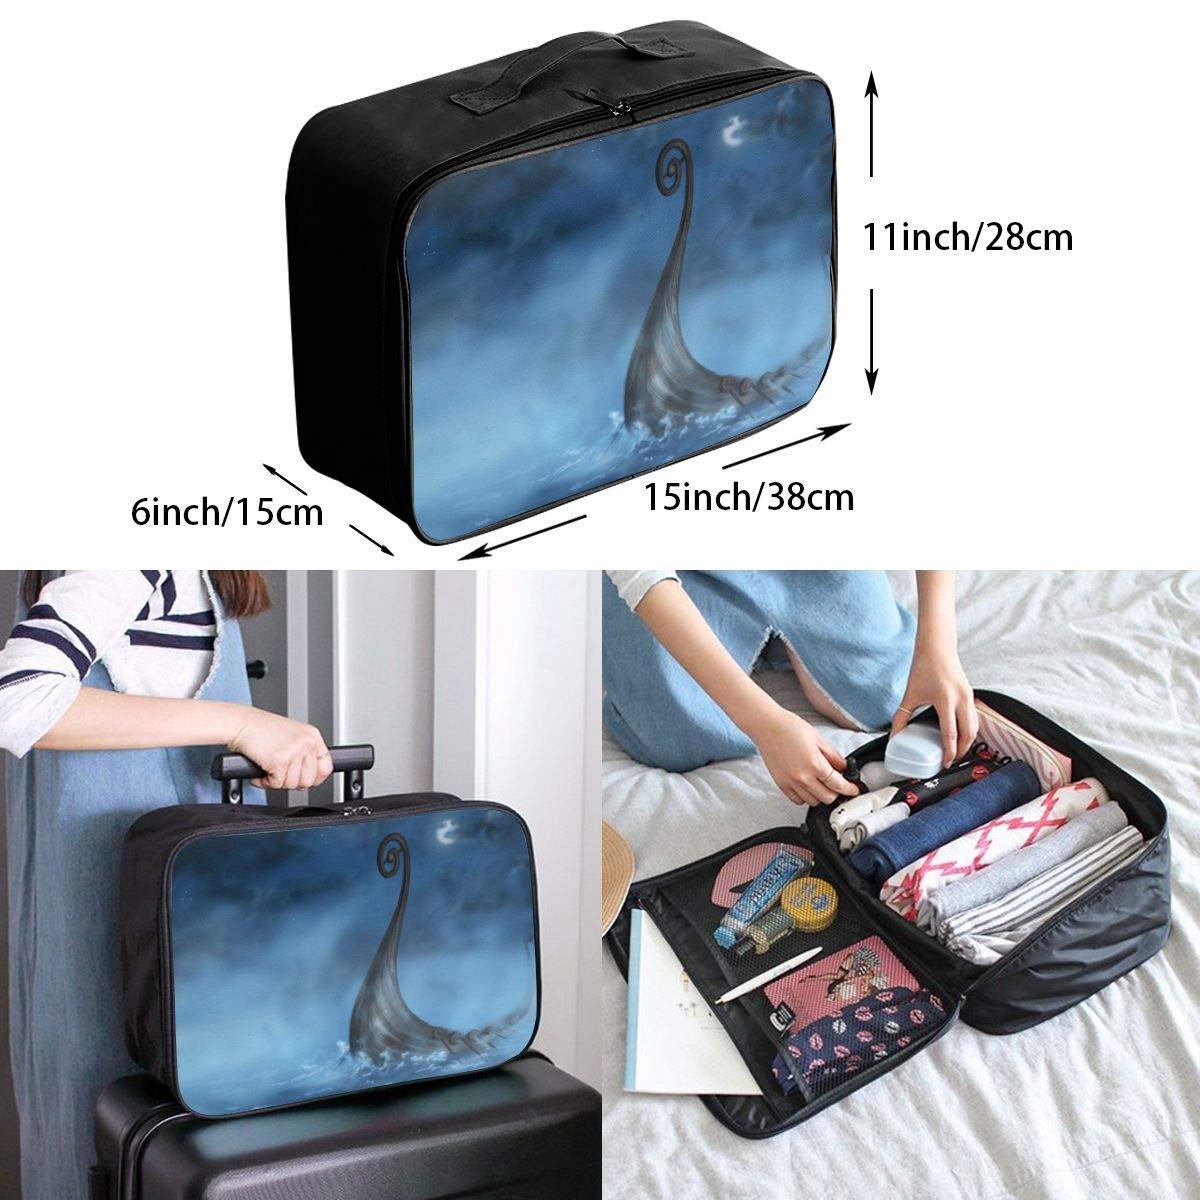 Travel Luggage Duffle Bag Lightweight Portable Handbag Fantasy Waves Night Moon Pattern Large Capacity Waterproof Foldable Storage Tote